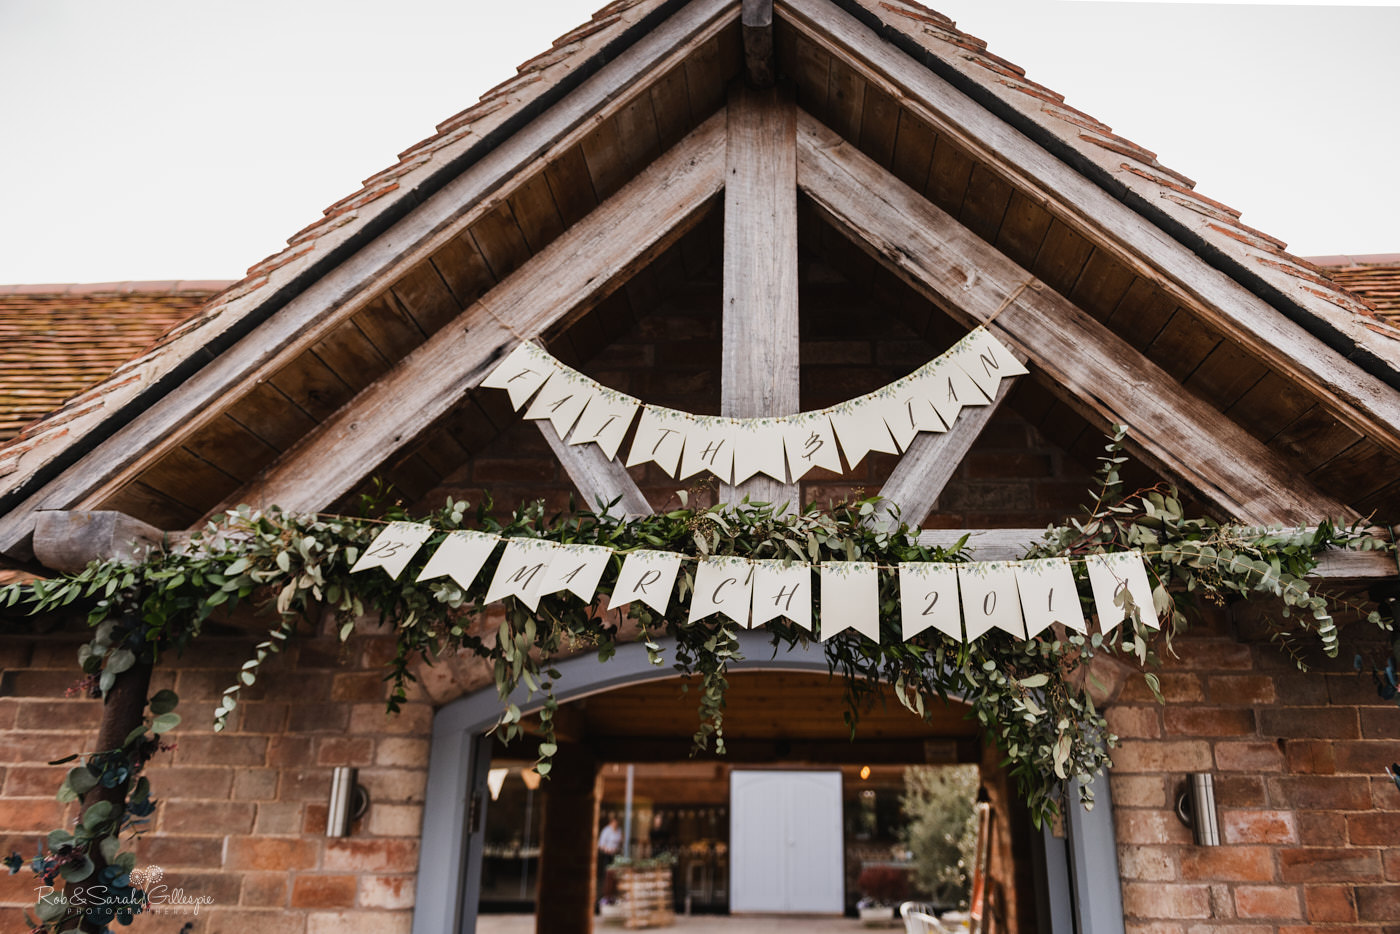 Swallows Nest Barn wedding venue in Warwickshire